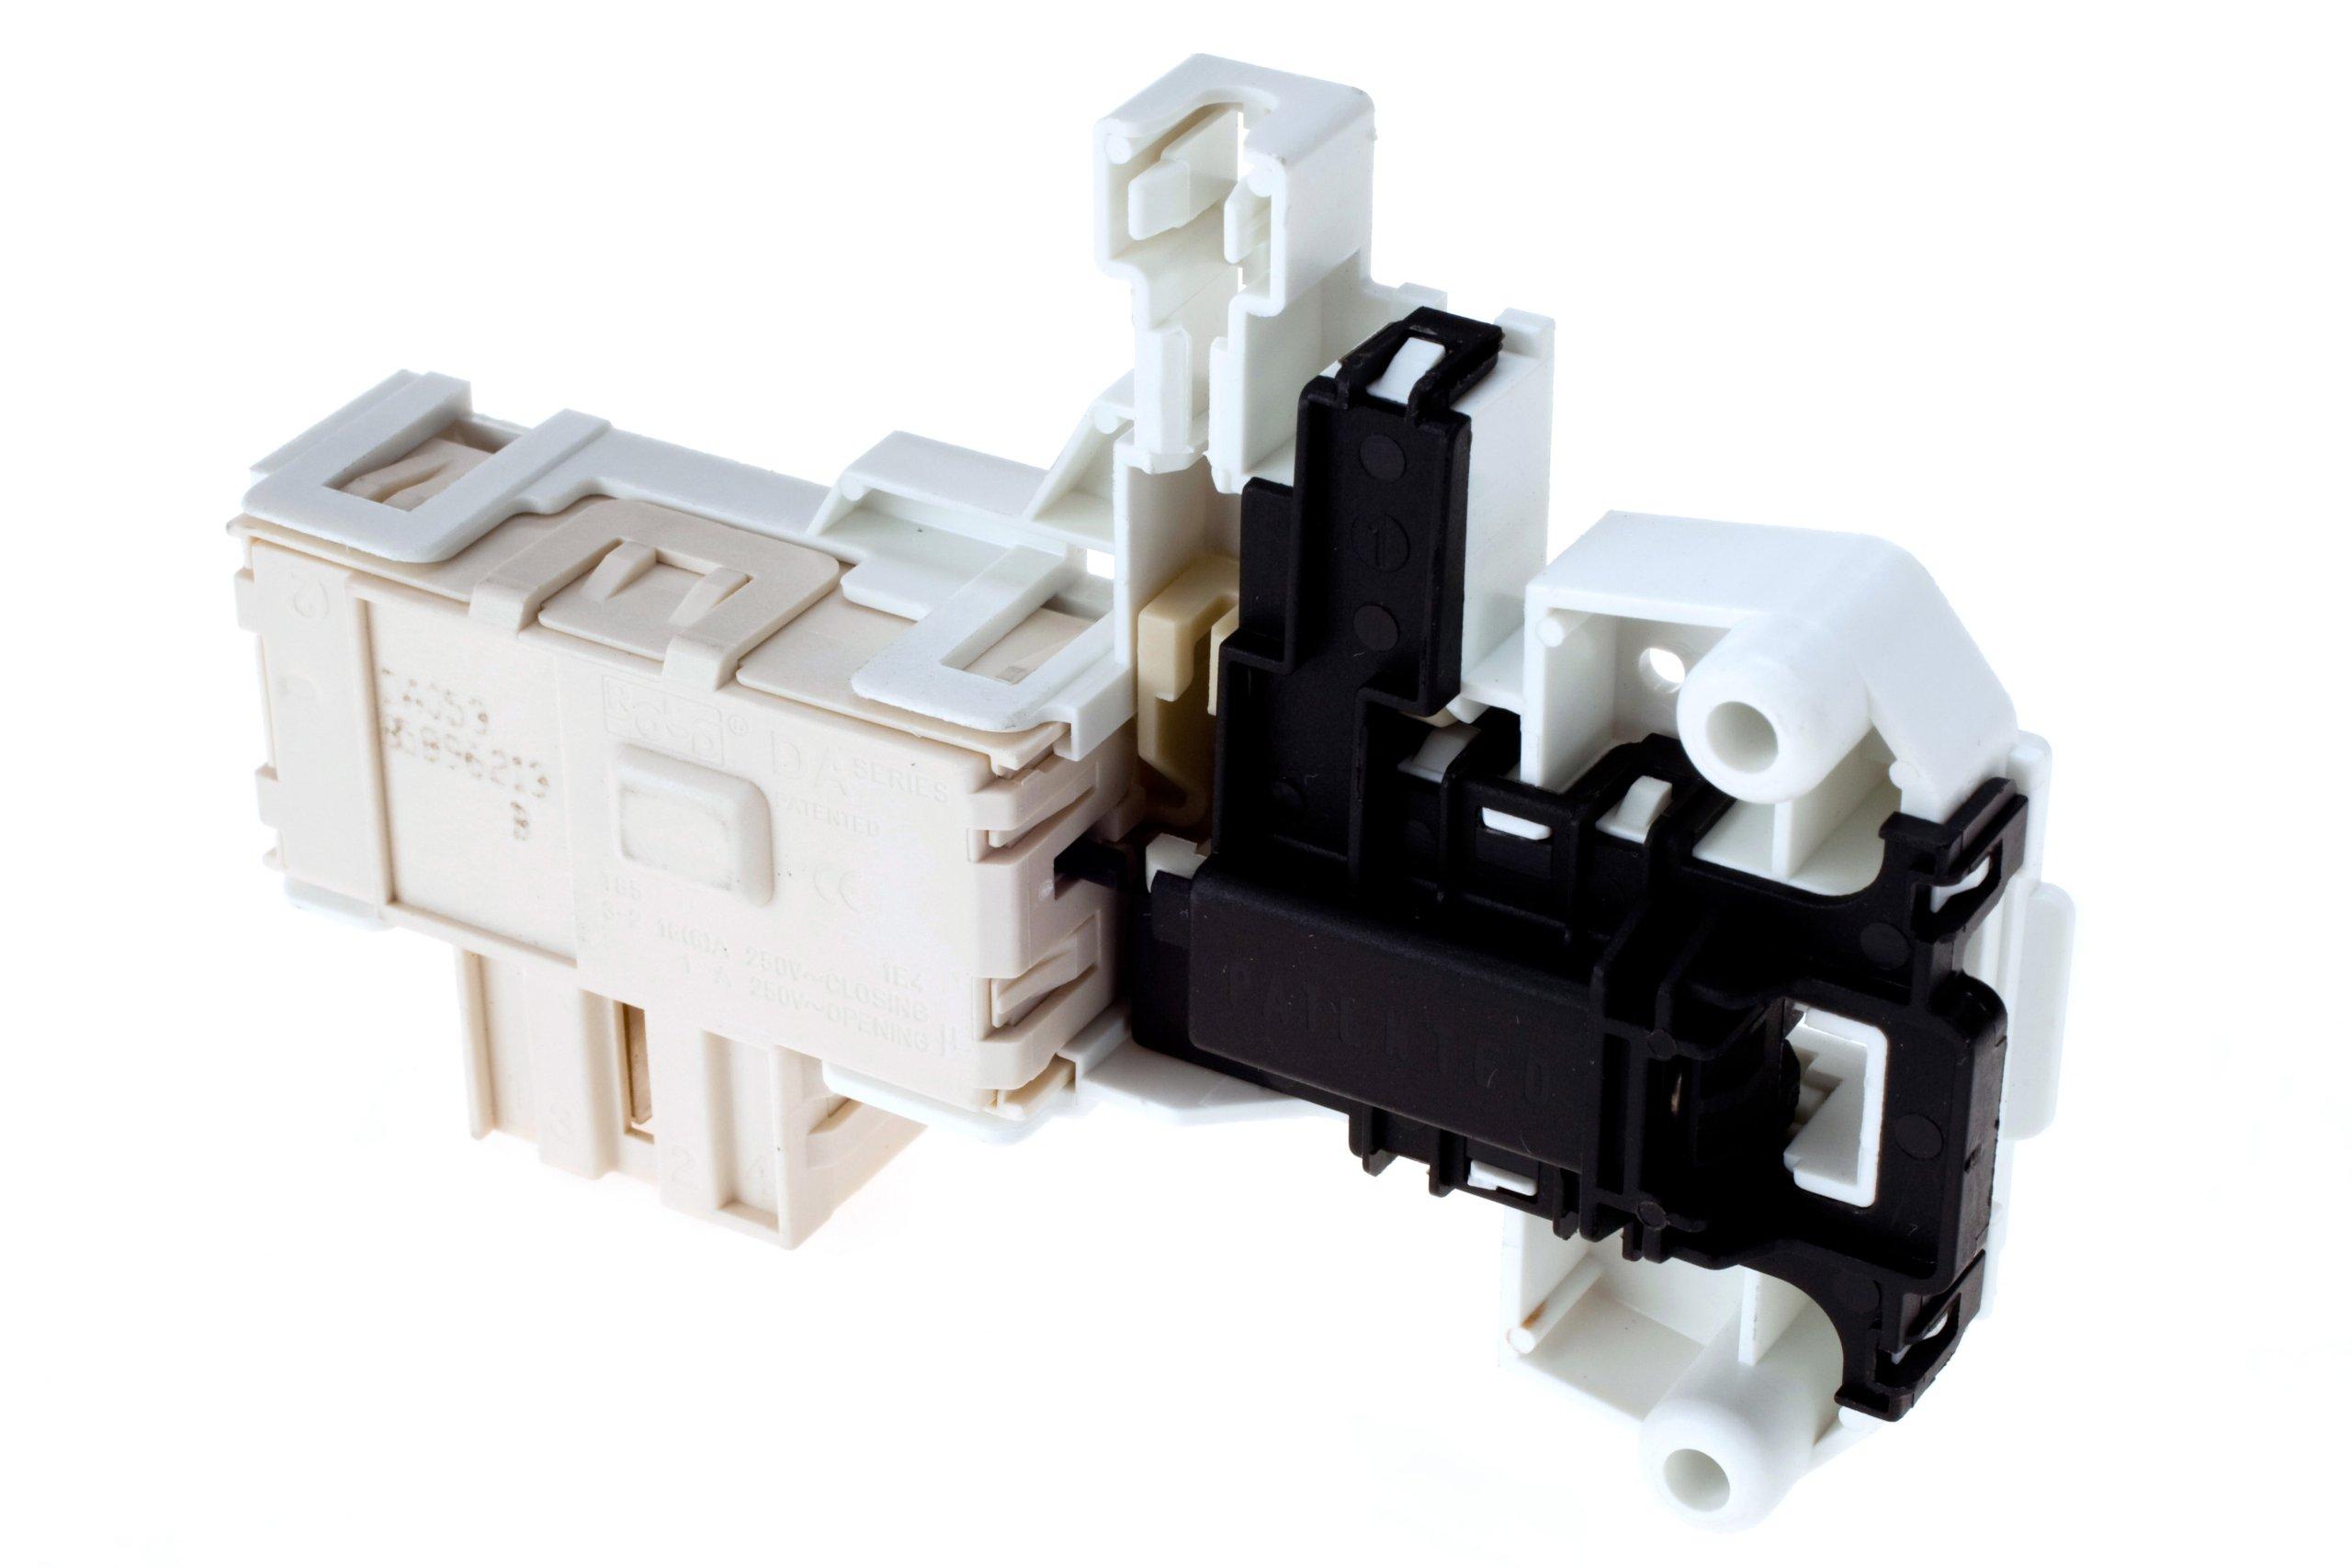 Hoover-90489300-Belling-Candy-Otsein-Rosieres-Tecnik-Zerowatt-Waschmaschine-TR-Interlock